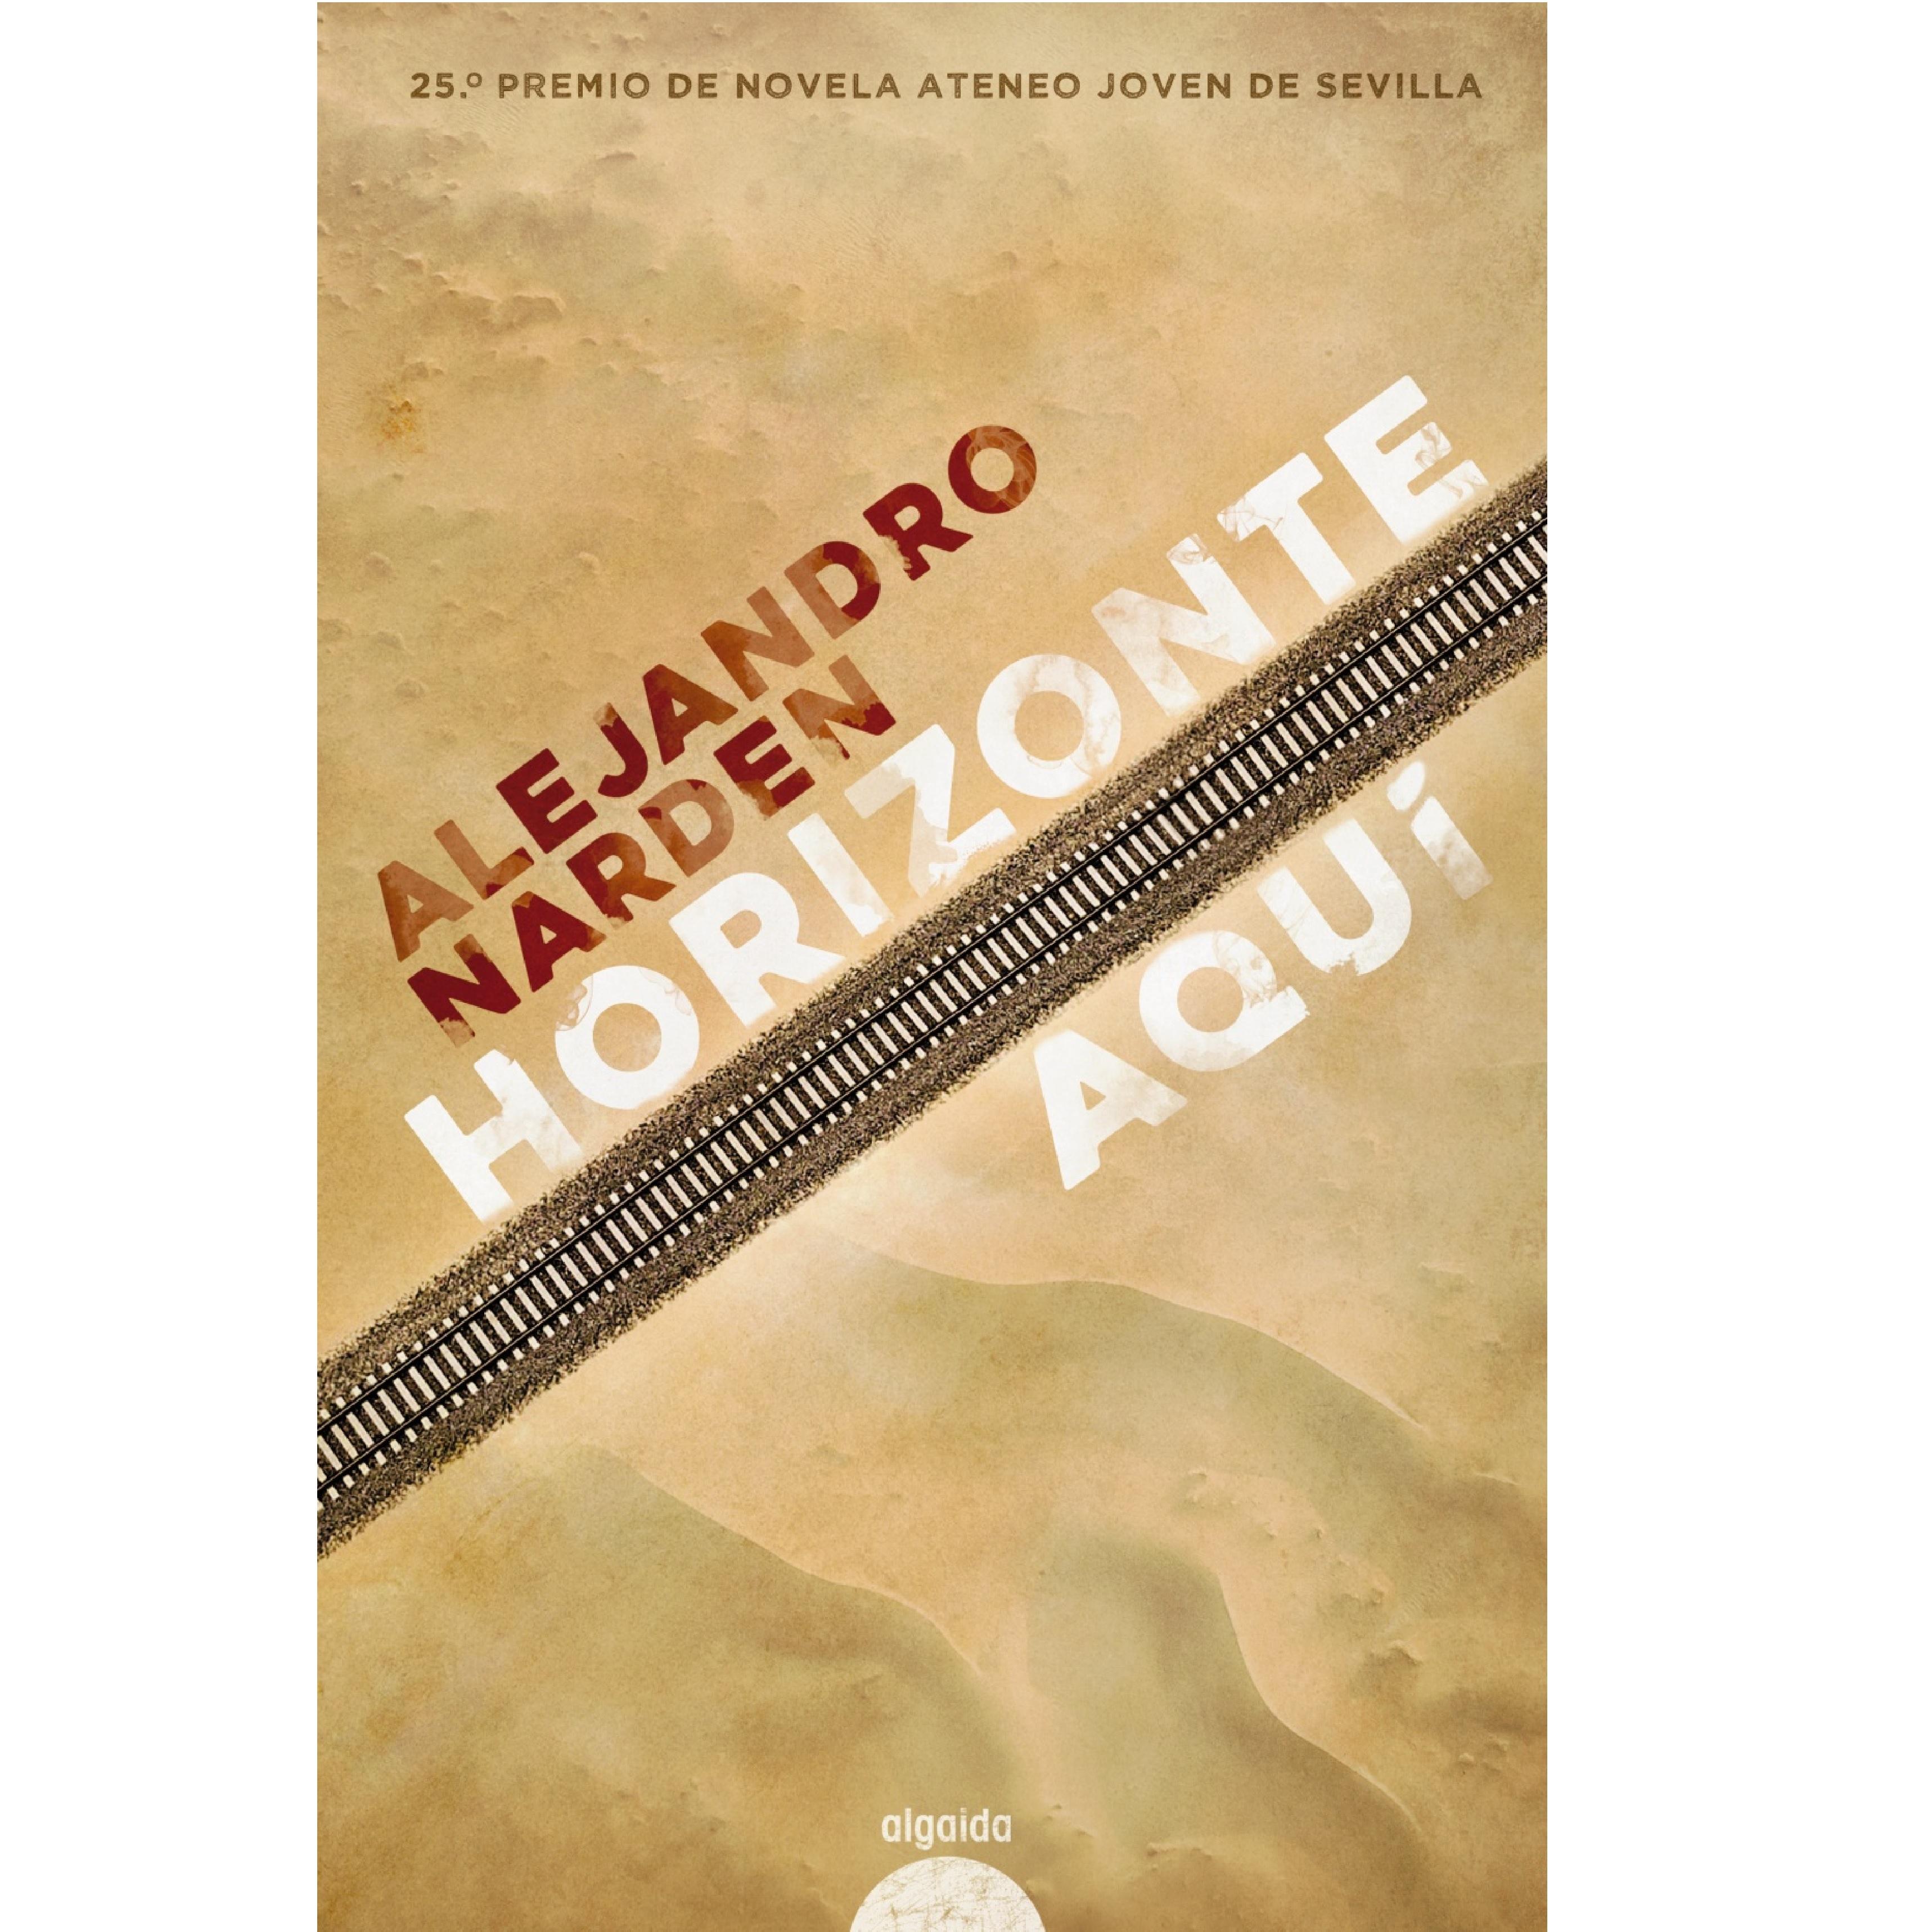 Portada de 'Horizonte aquí', de Alejandro Narden.